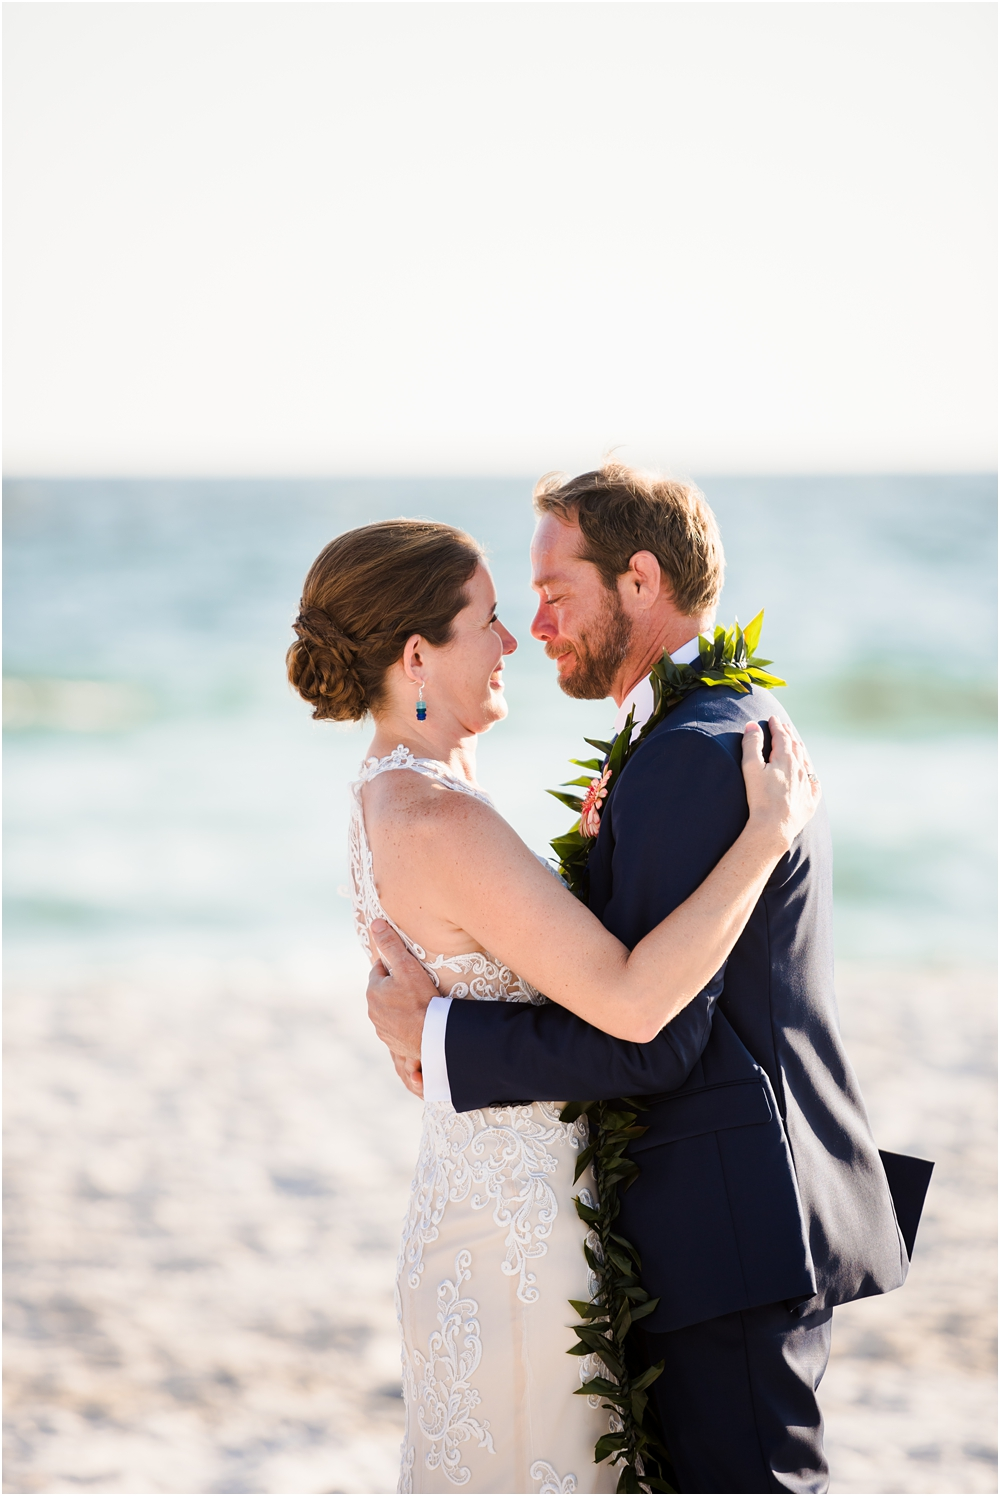 ledman-wedding-kiersten-stevenson-photography-30a-panama-city-beach-dothan-tallahassee-(245-of-763).JPG